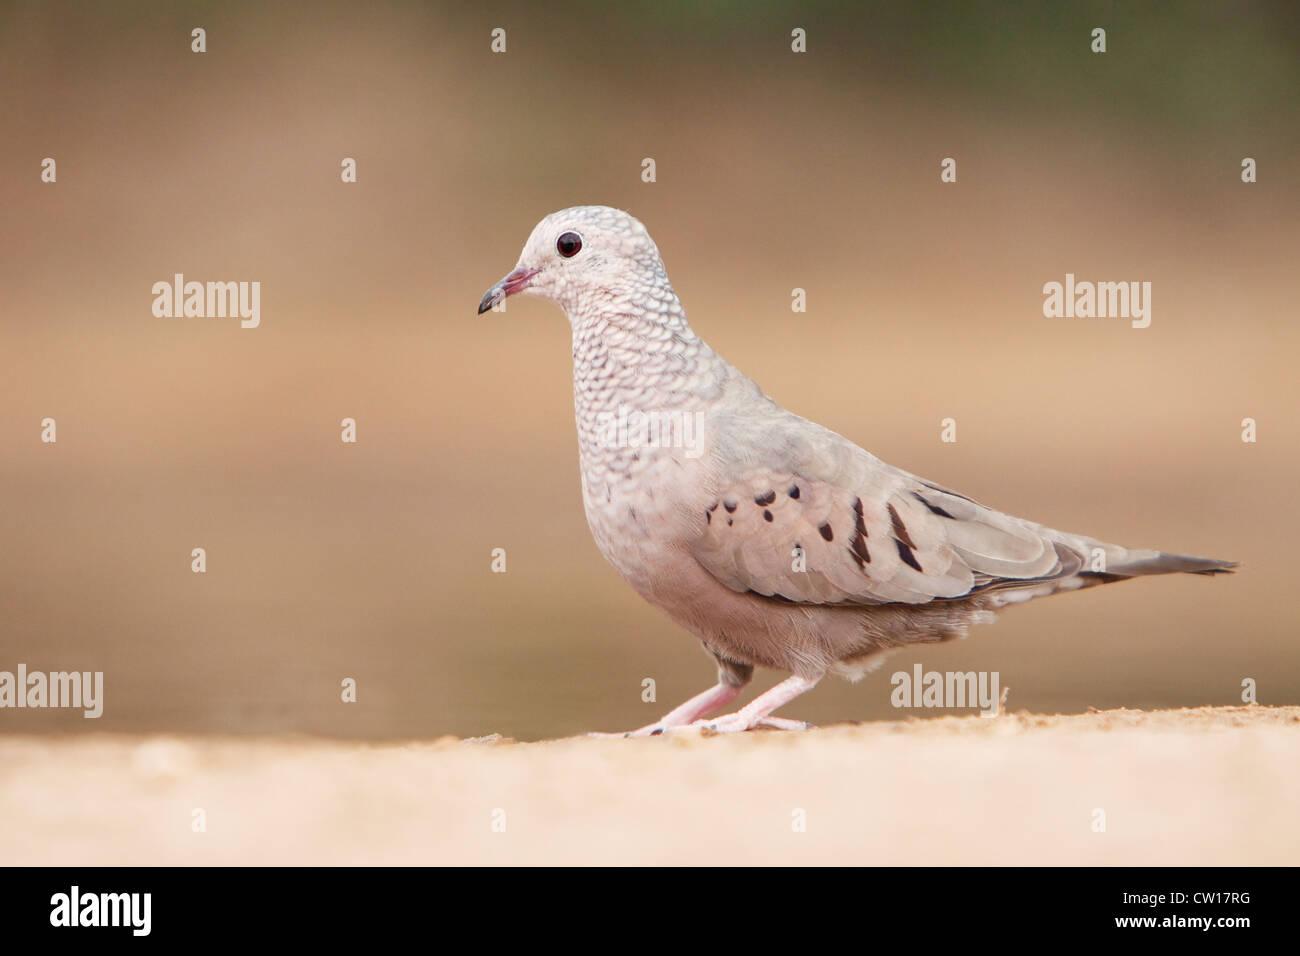 Ground Dove Columbigallina passerina South Texas, USA BI023008 - Stock Image